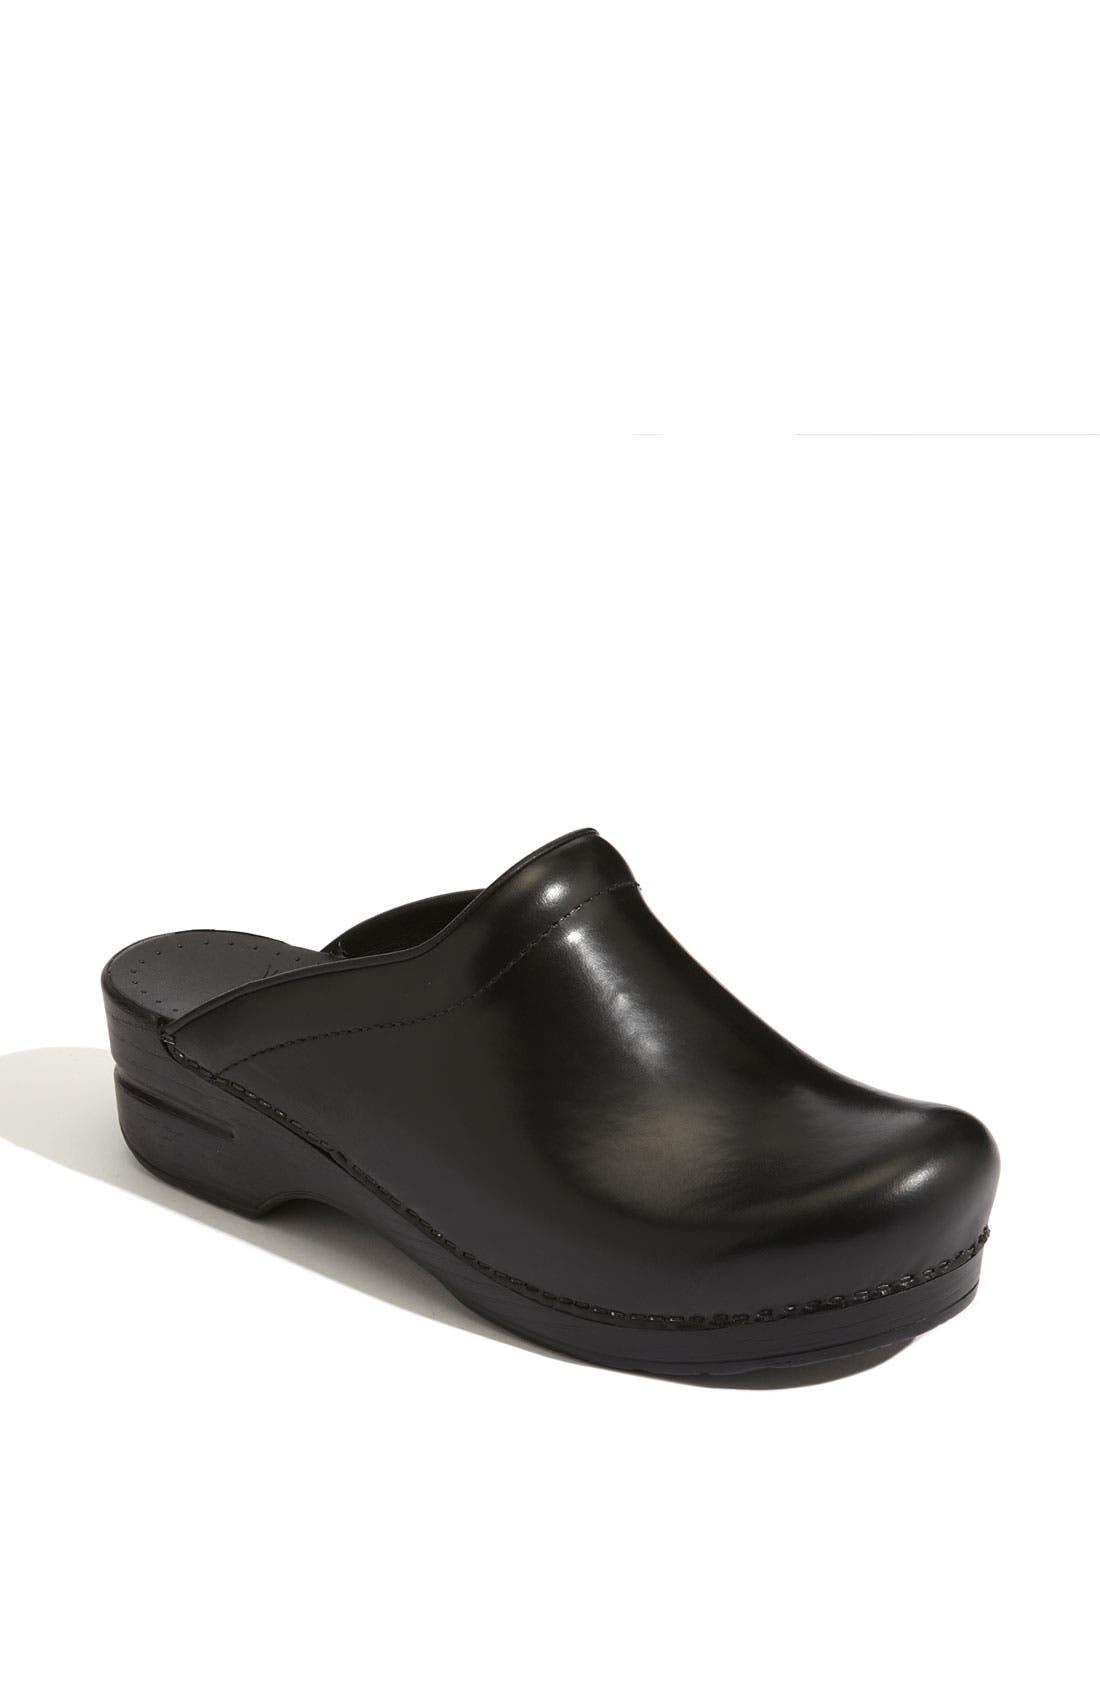 'Sonja' Leather Clog